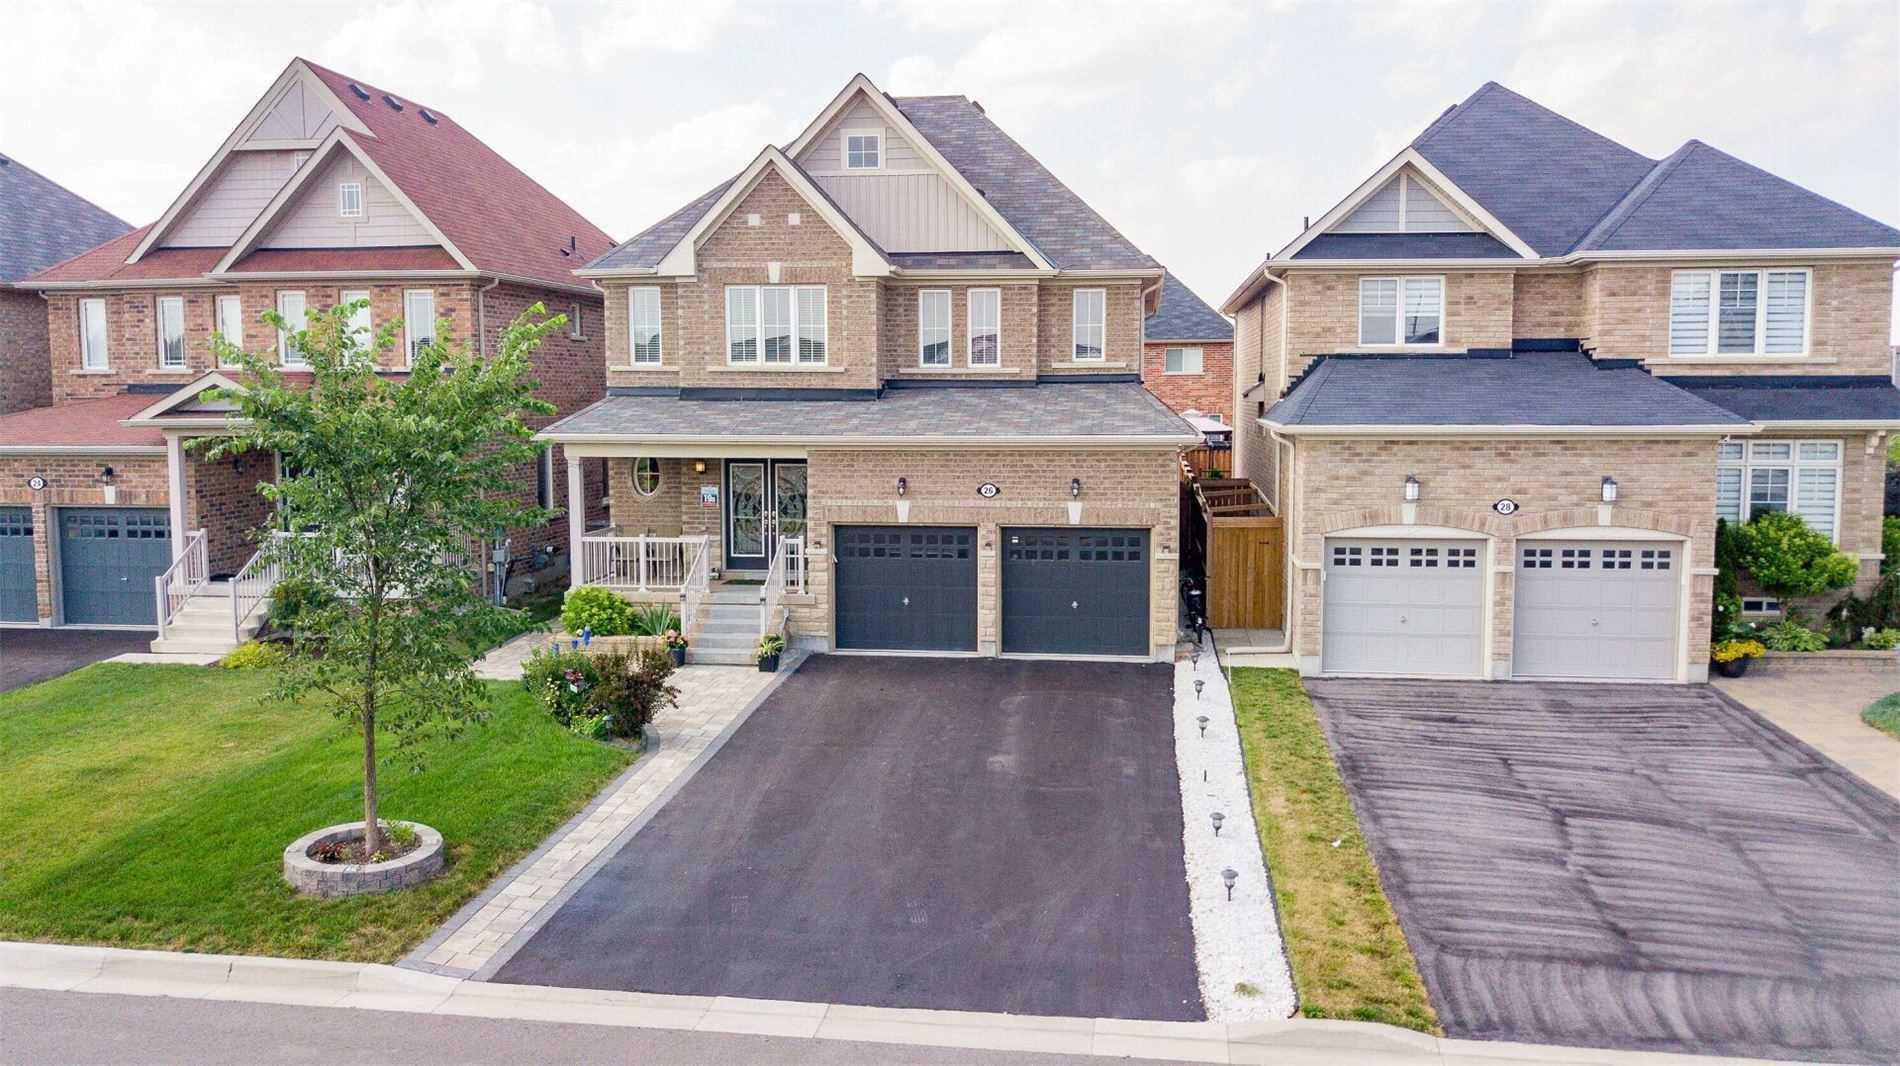 Detached house For Sale In New Tecumseth - 26 Gunning Cres, New Tecumseth, Ontario, Canada L0G1W0 , 4 Bedrooms Bedrooms, ,4 BathroomsBathrooms,Detached,For Sale,Gunning